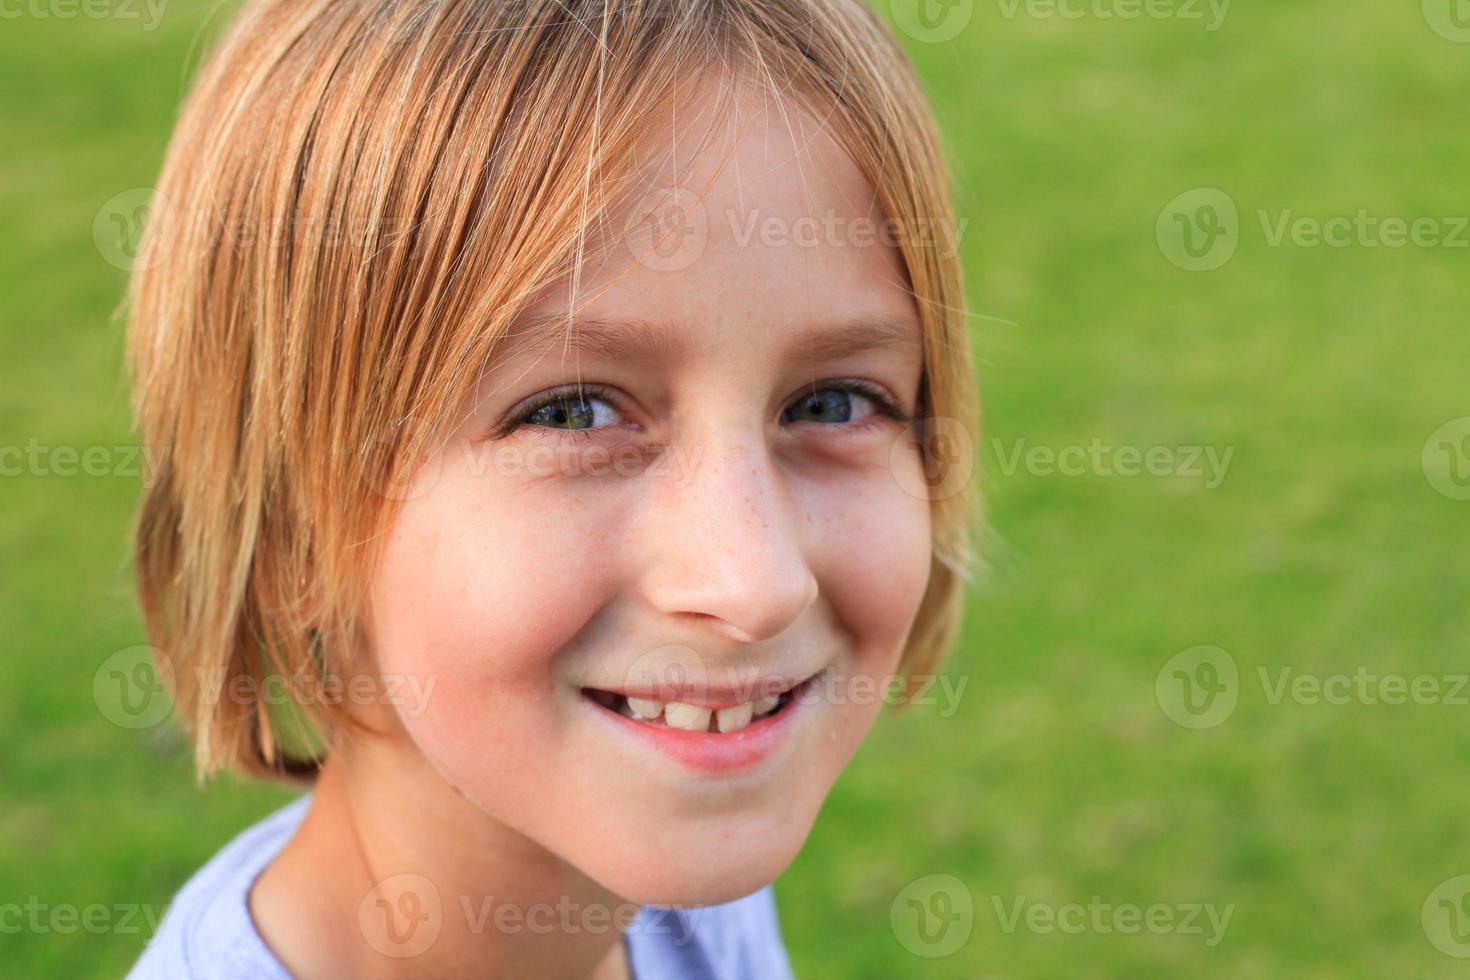 estudante caucasiano de cabelos compridos bonito ao ar livre foto